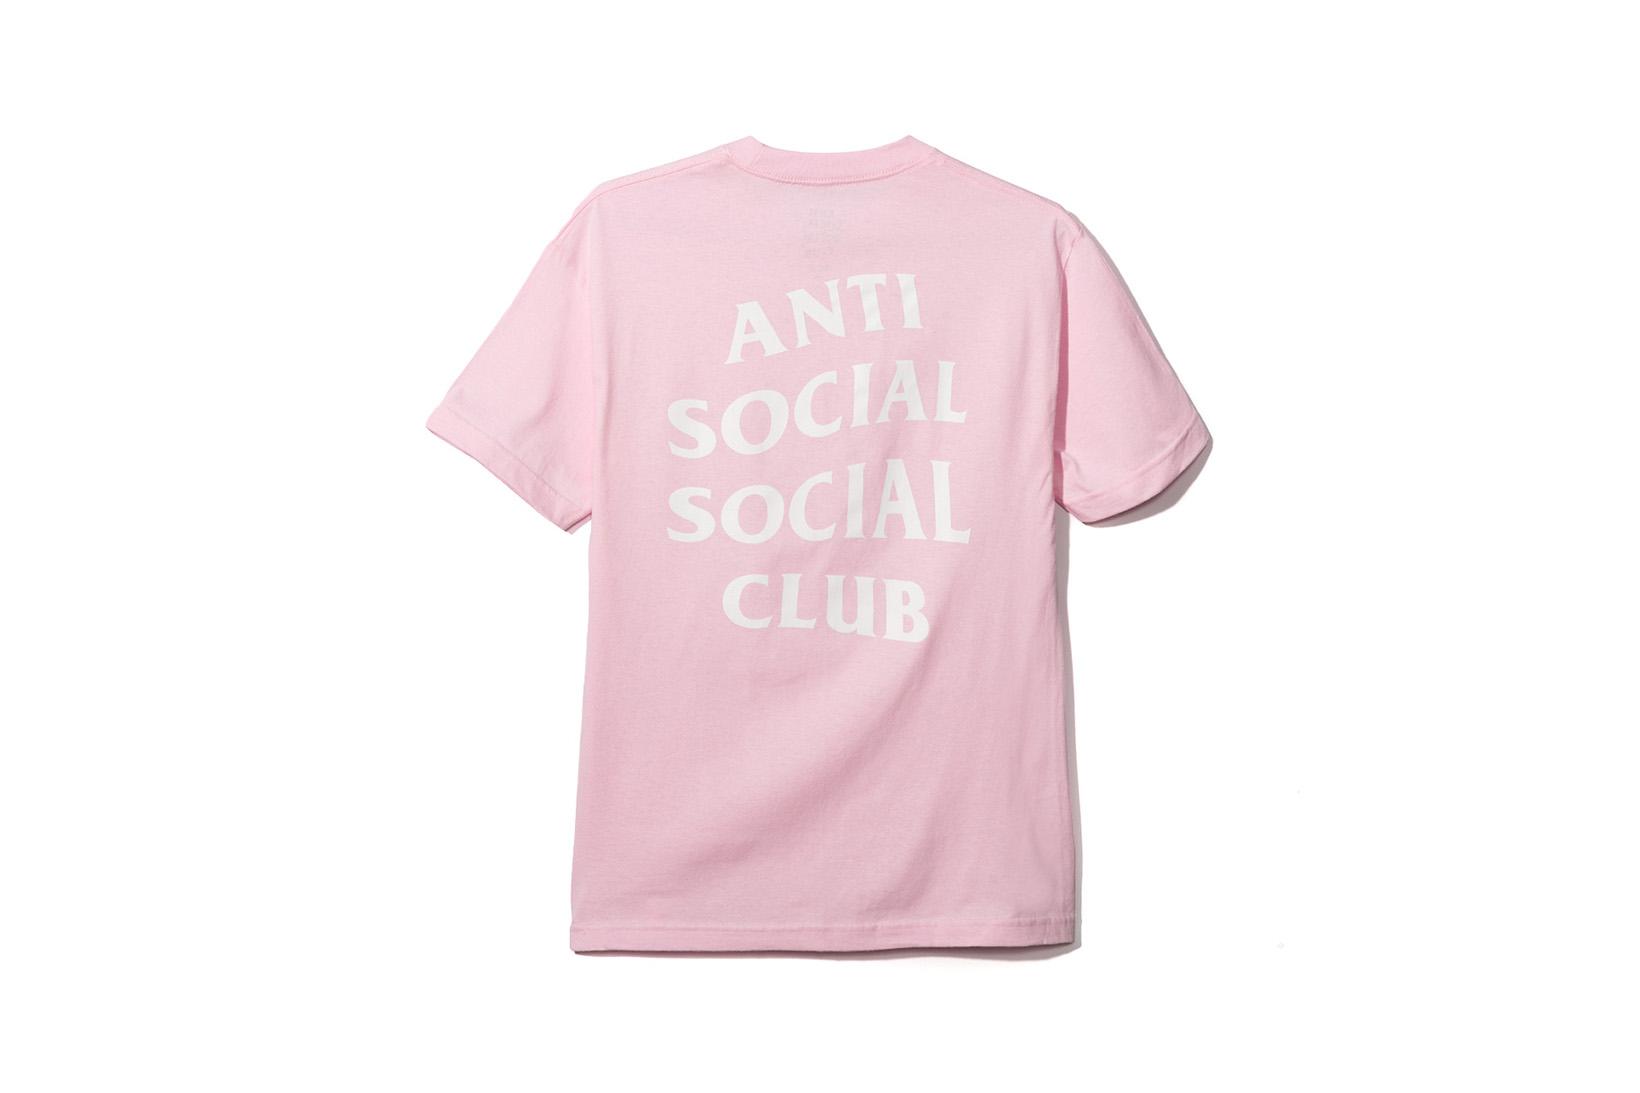 Anti Social Social Club 2017 Spring Summer - 3744350